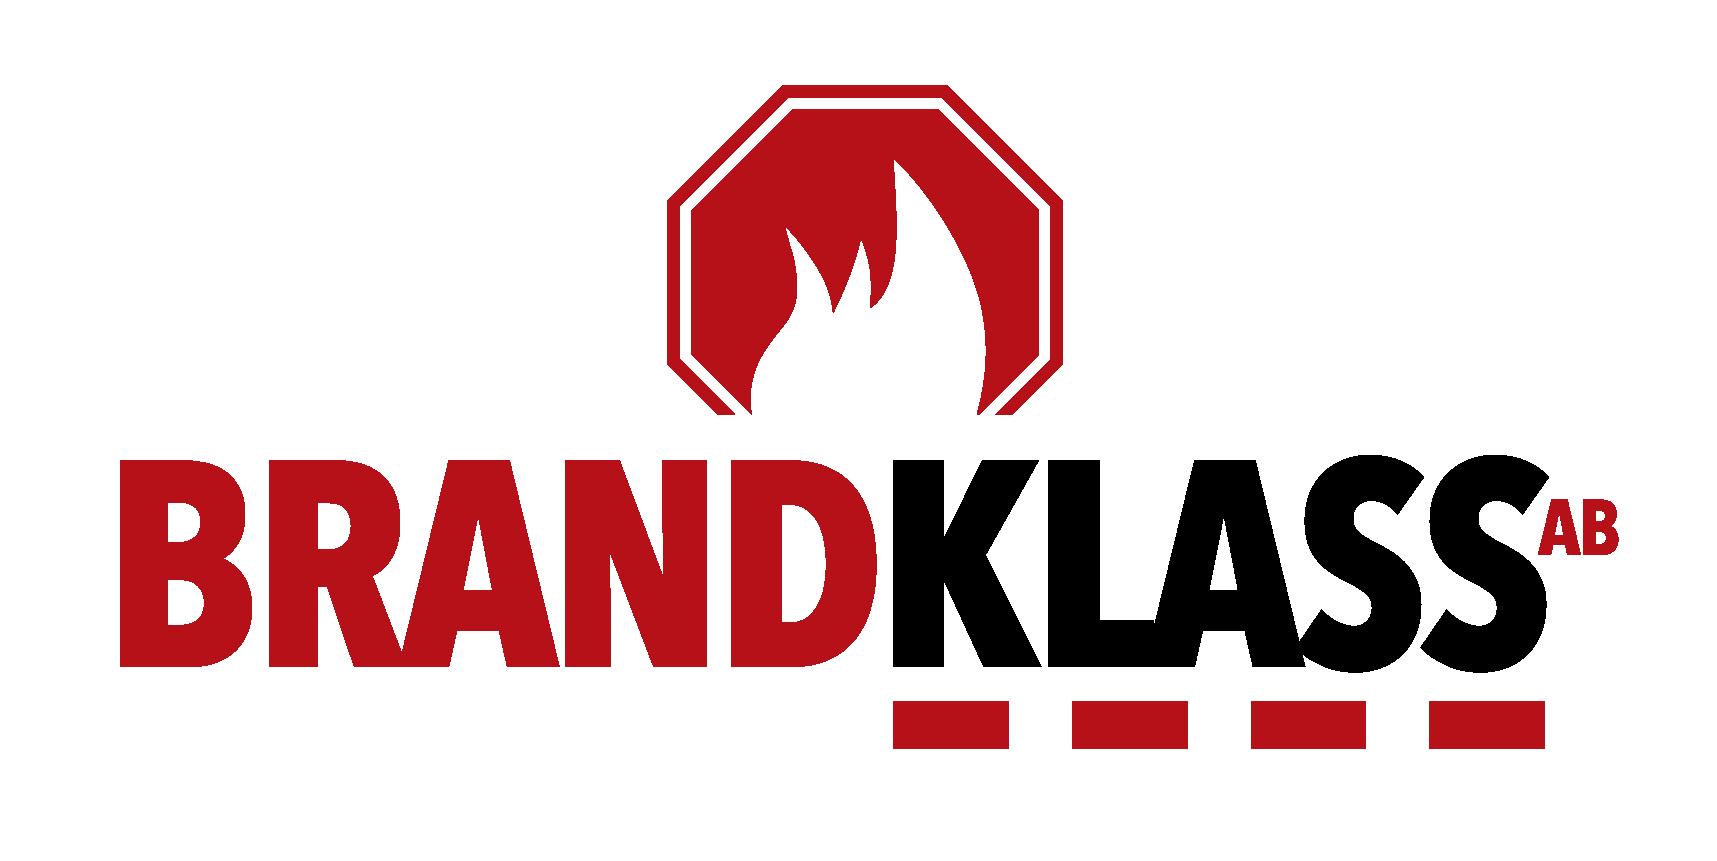 Brandklass